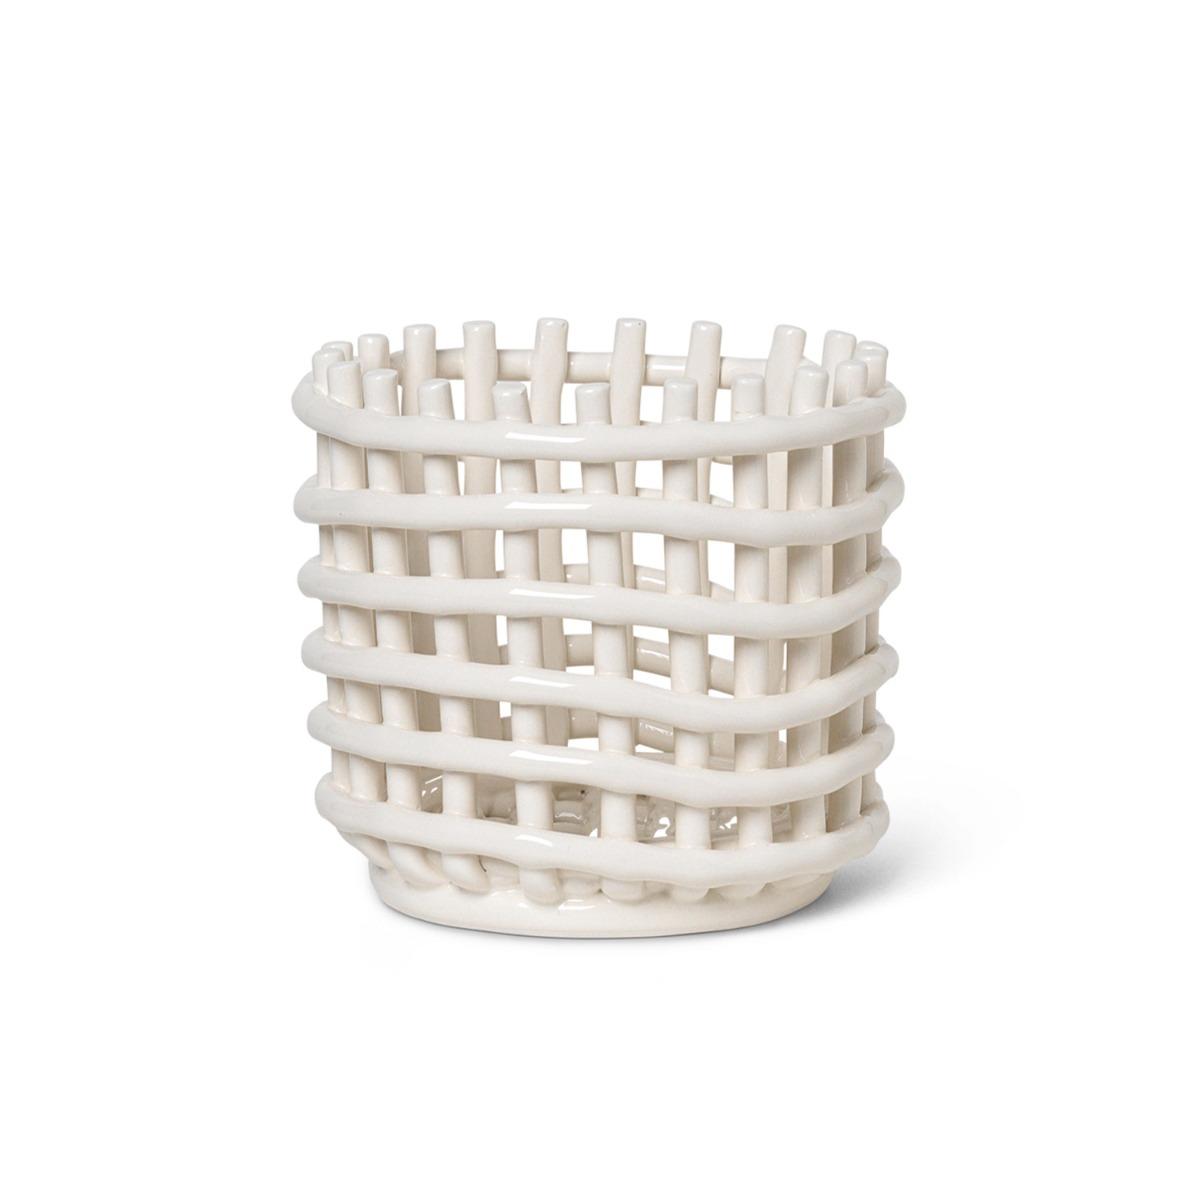 Designtorget Korg i Keramik Off White